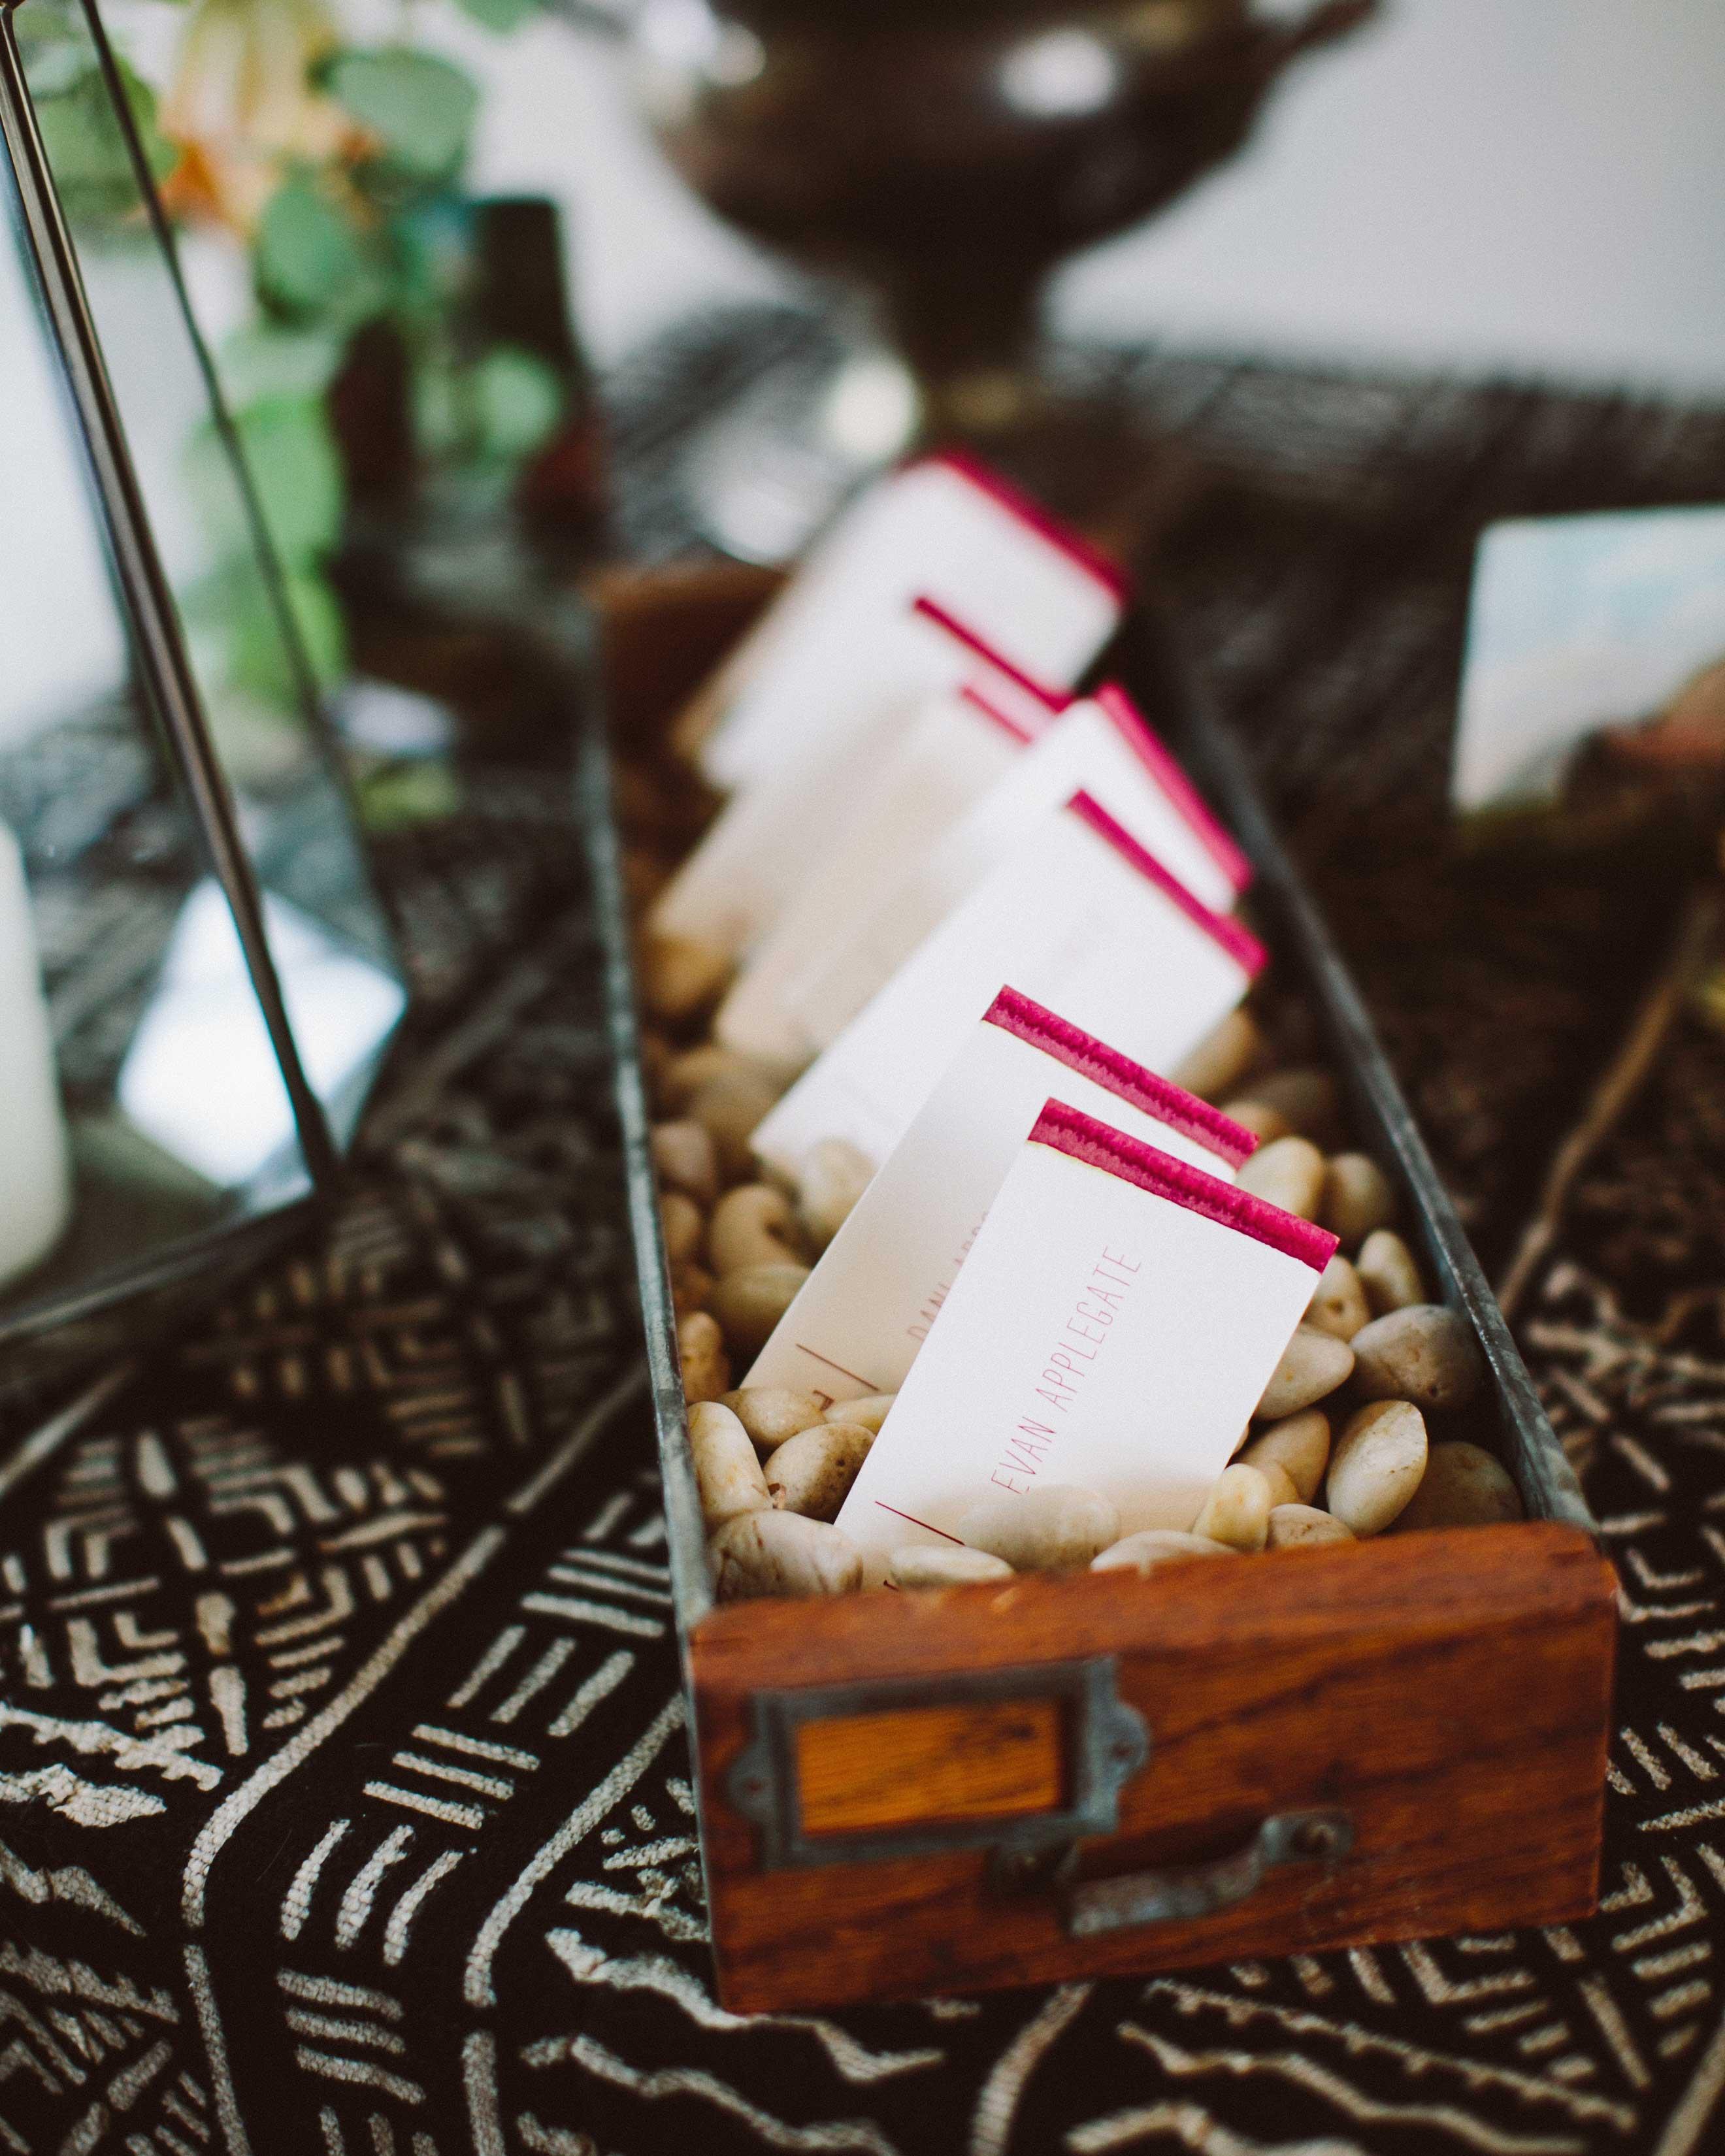 alisa-barrett-wedding-escortcards-974-s113048-0716.jpg